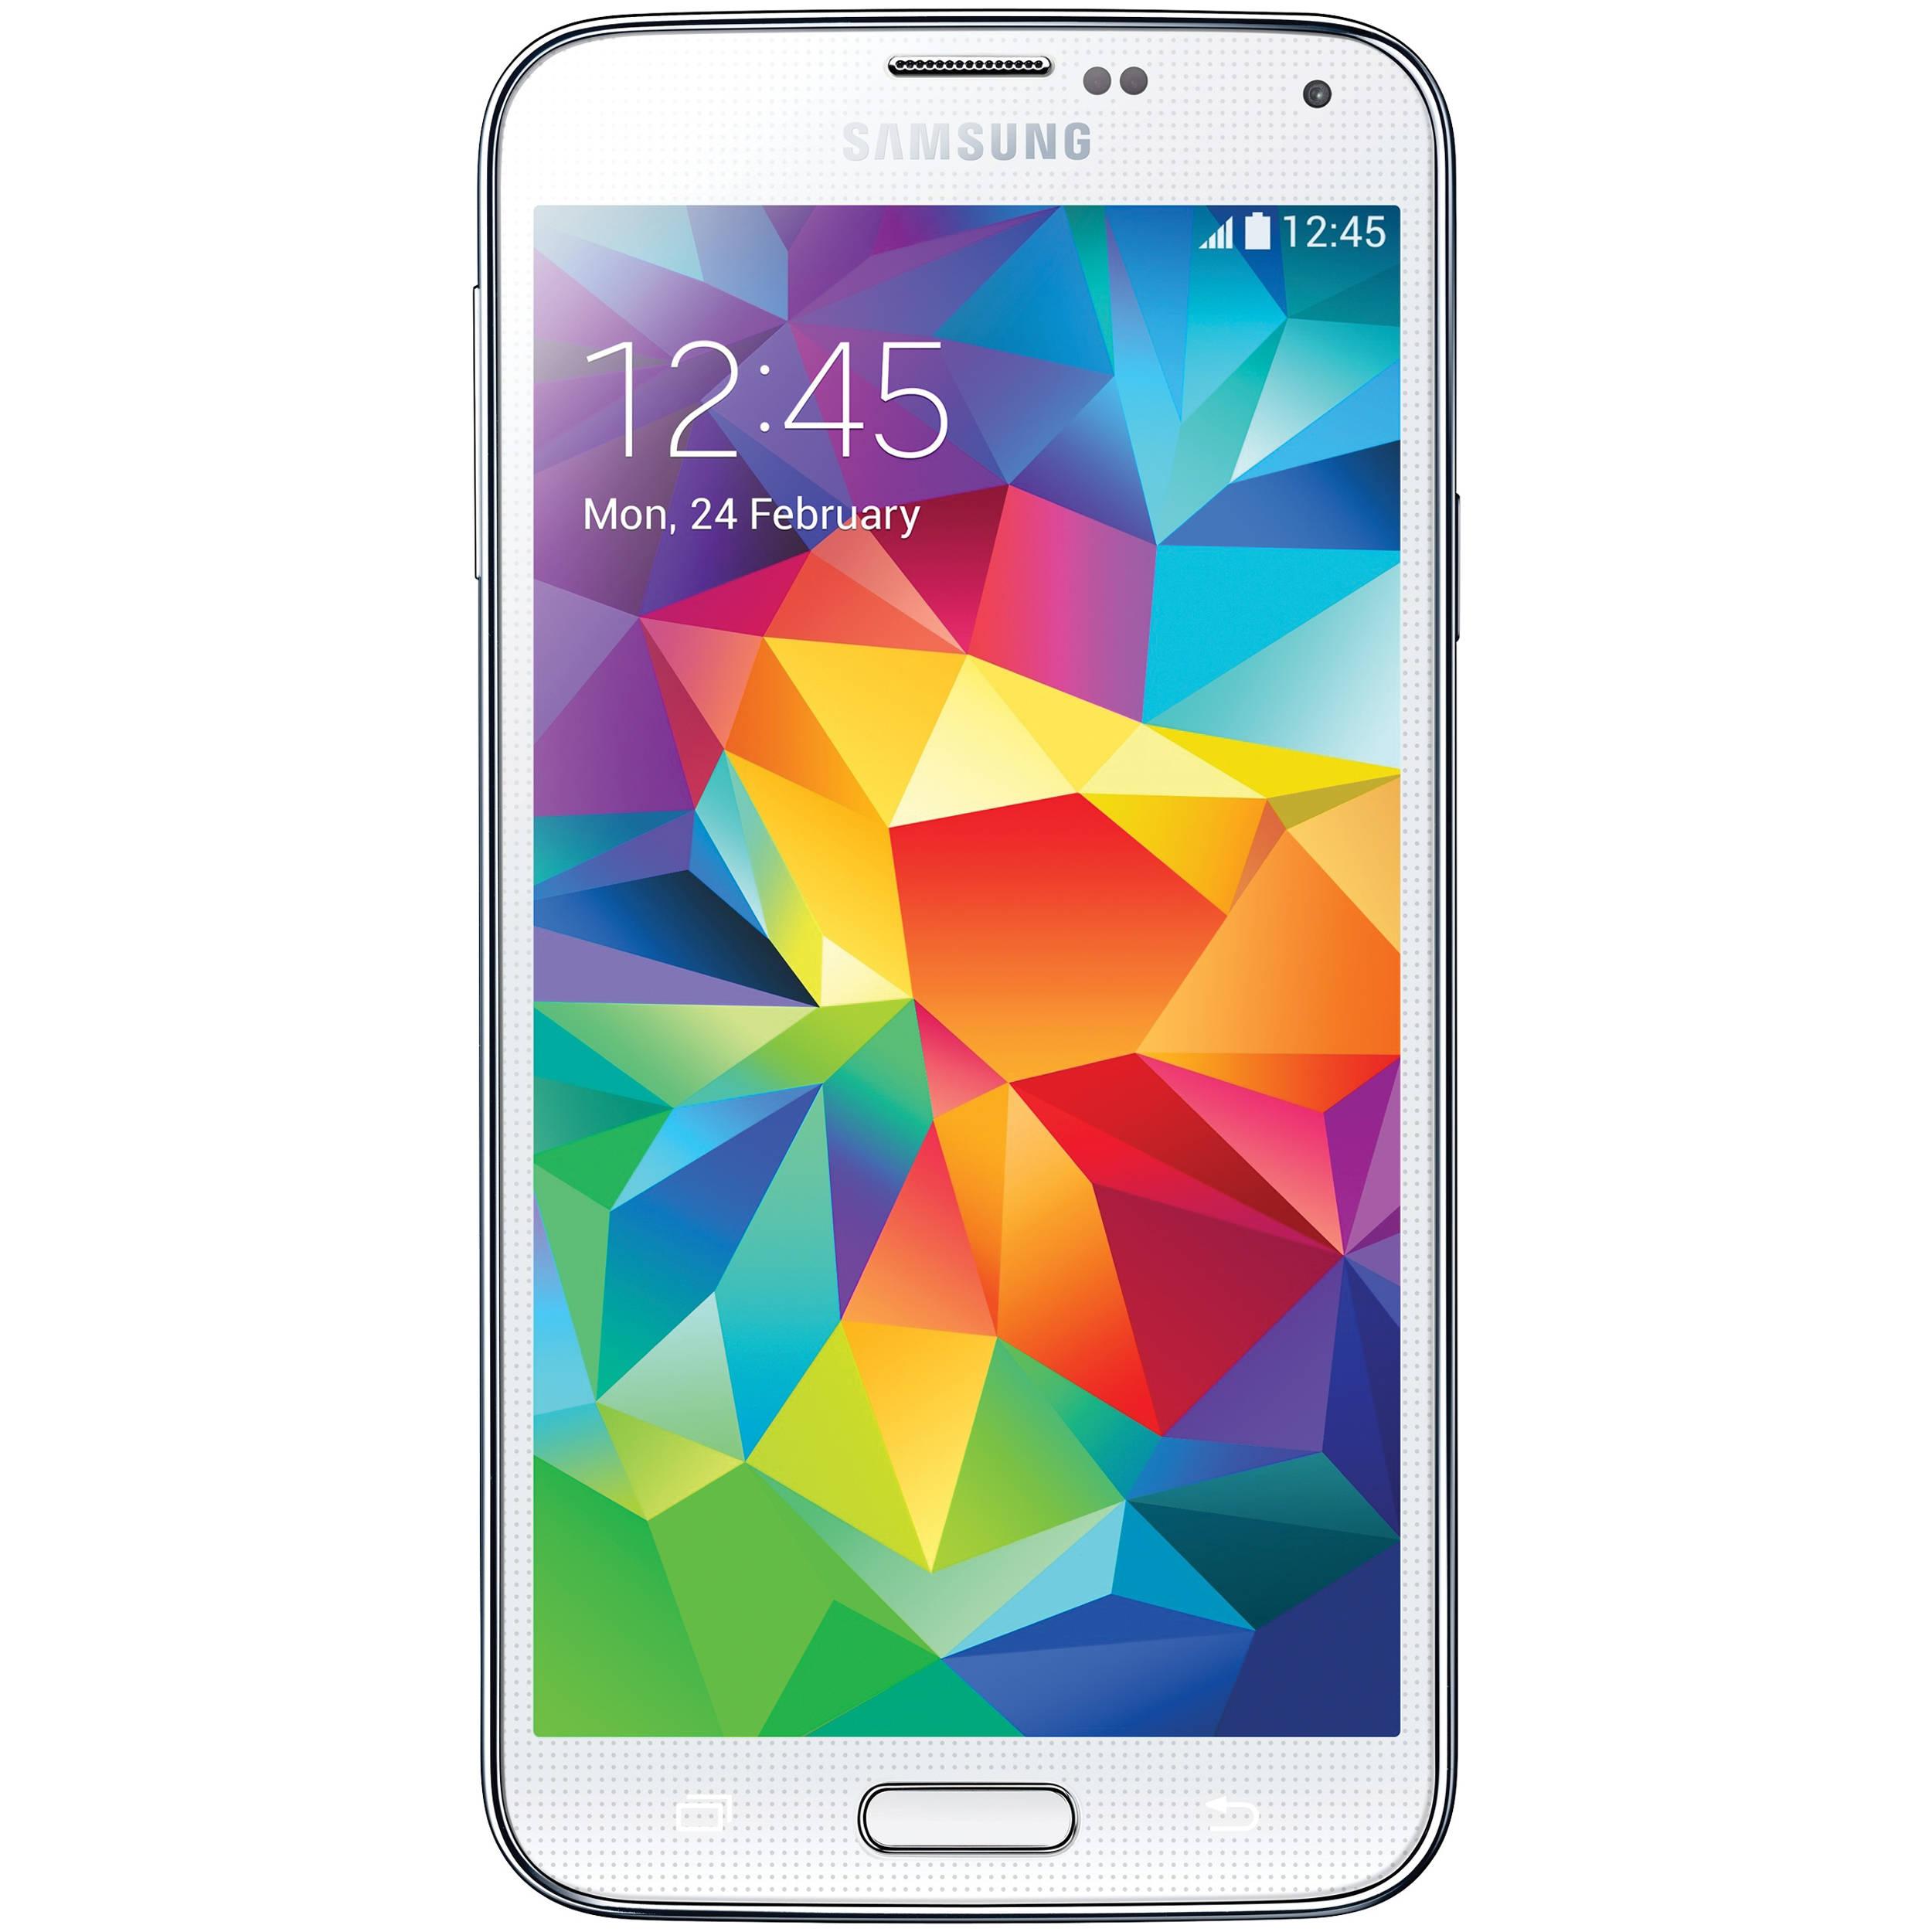 samsung galaxy s5 sm g900h 16gb smartphone sm g900h white b h. Black Bedroom Furniture Sets. Home Design Ideas